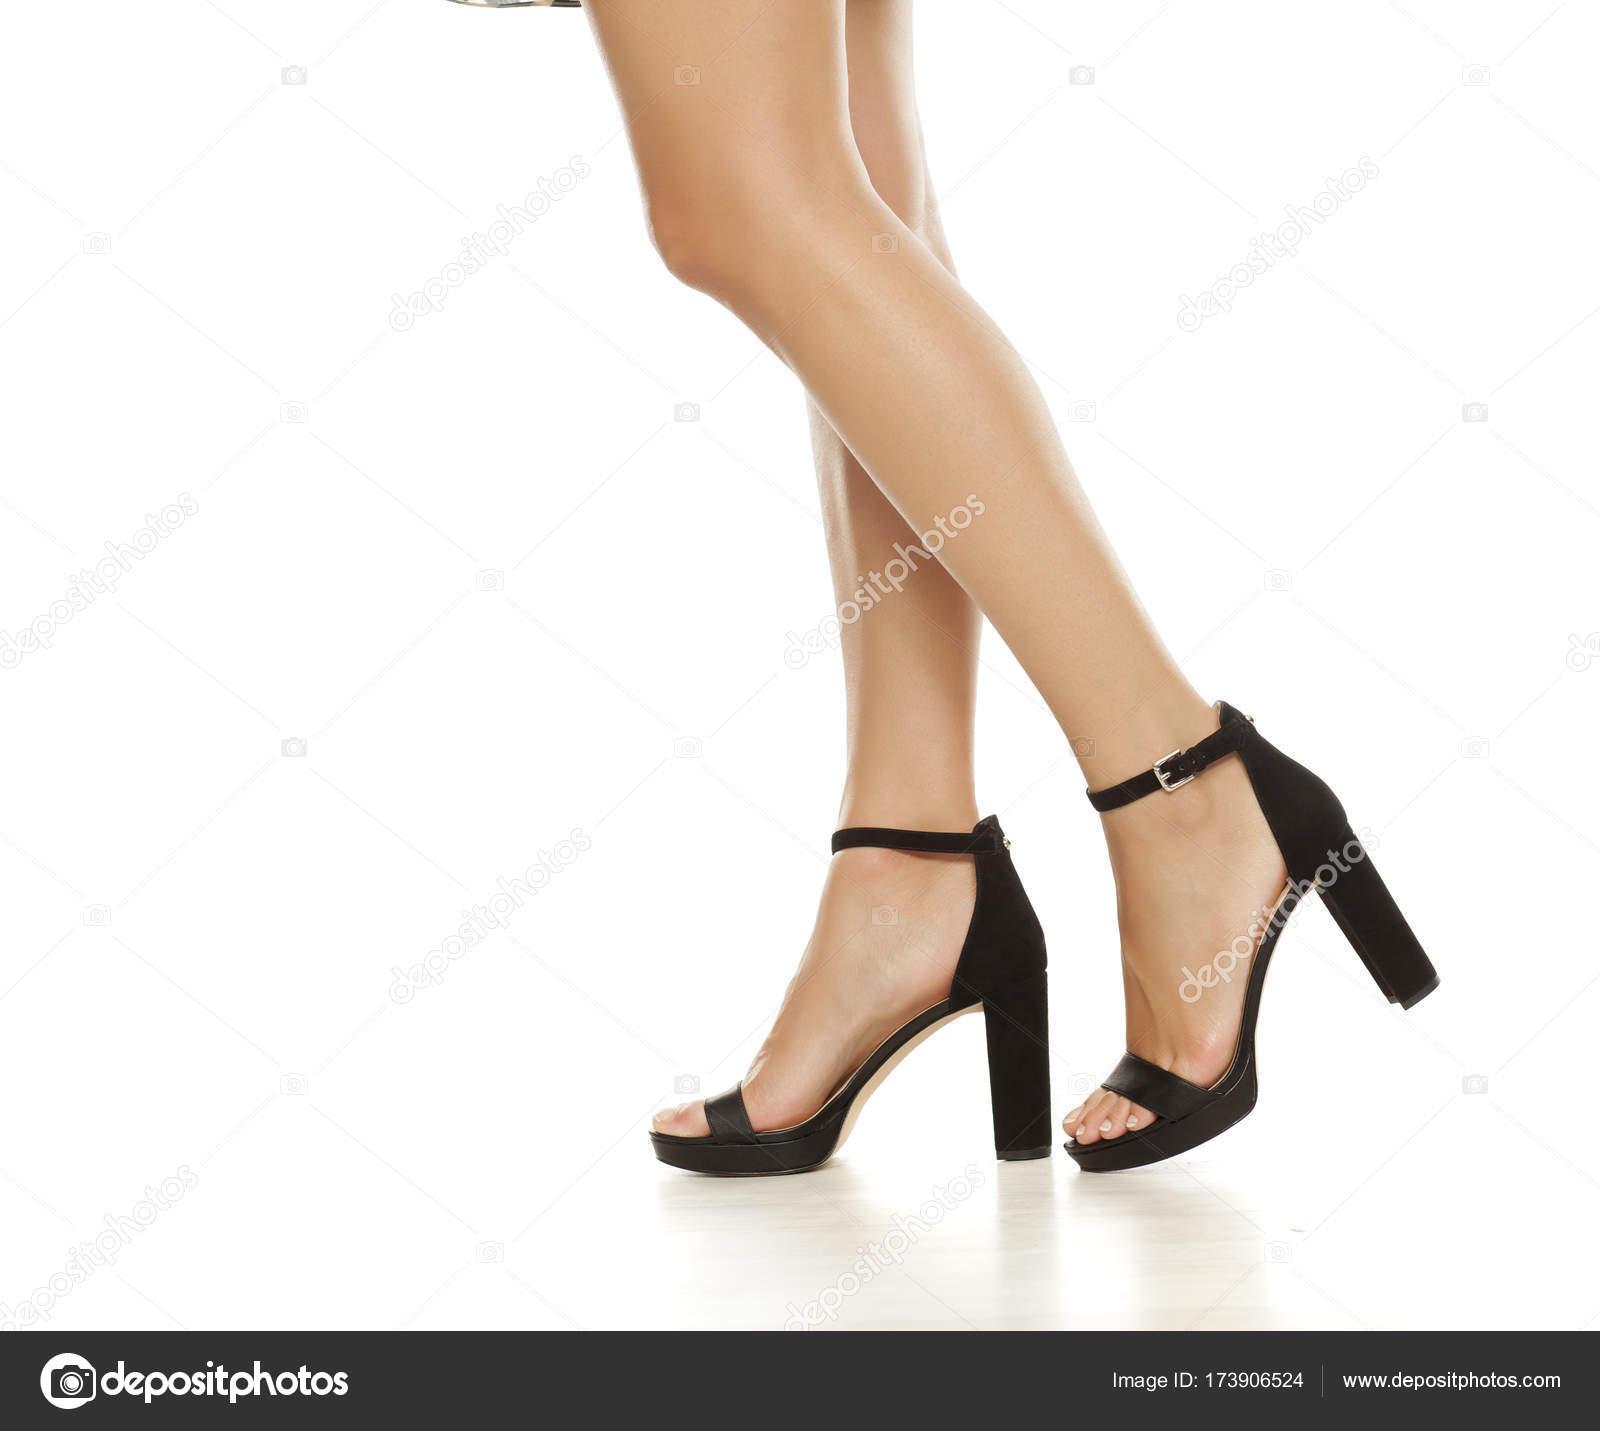 Sandali Bianco Tacco Gambe Foto Alto Belle Sfondo Stock — v0wPyNnO8m